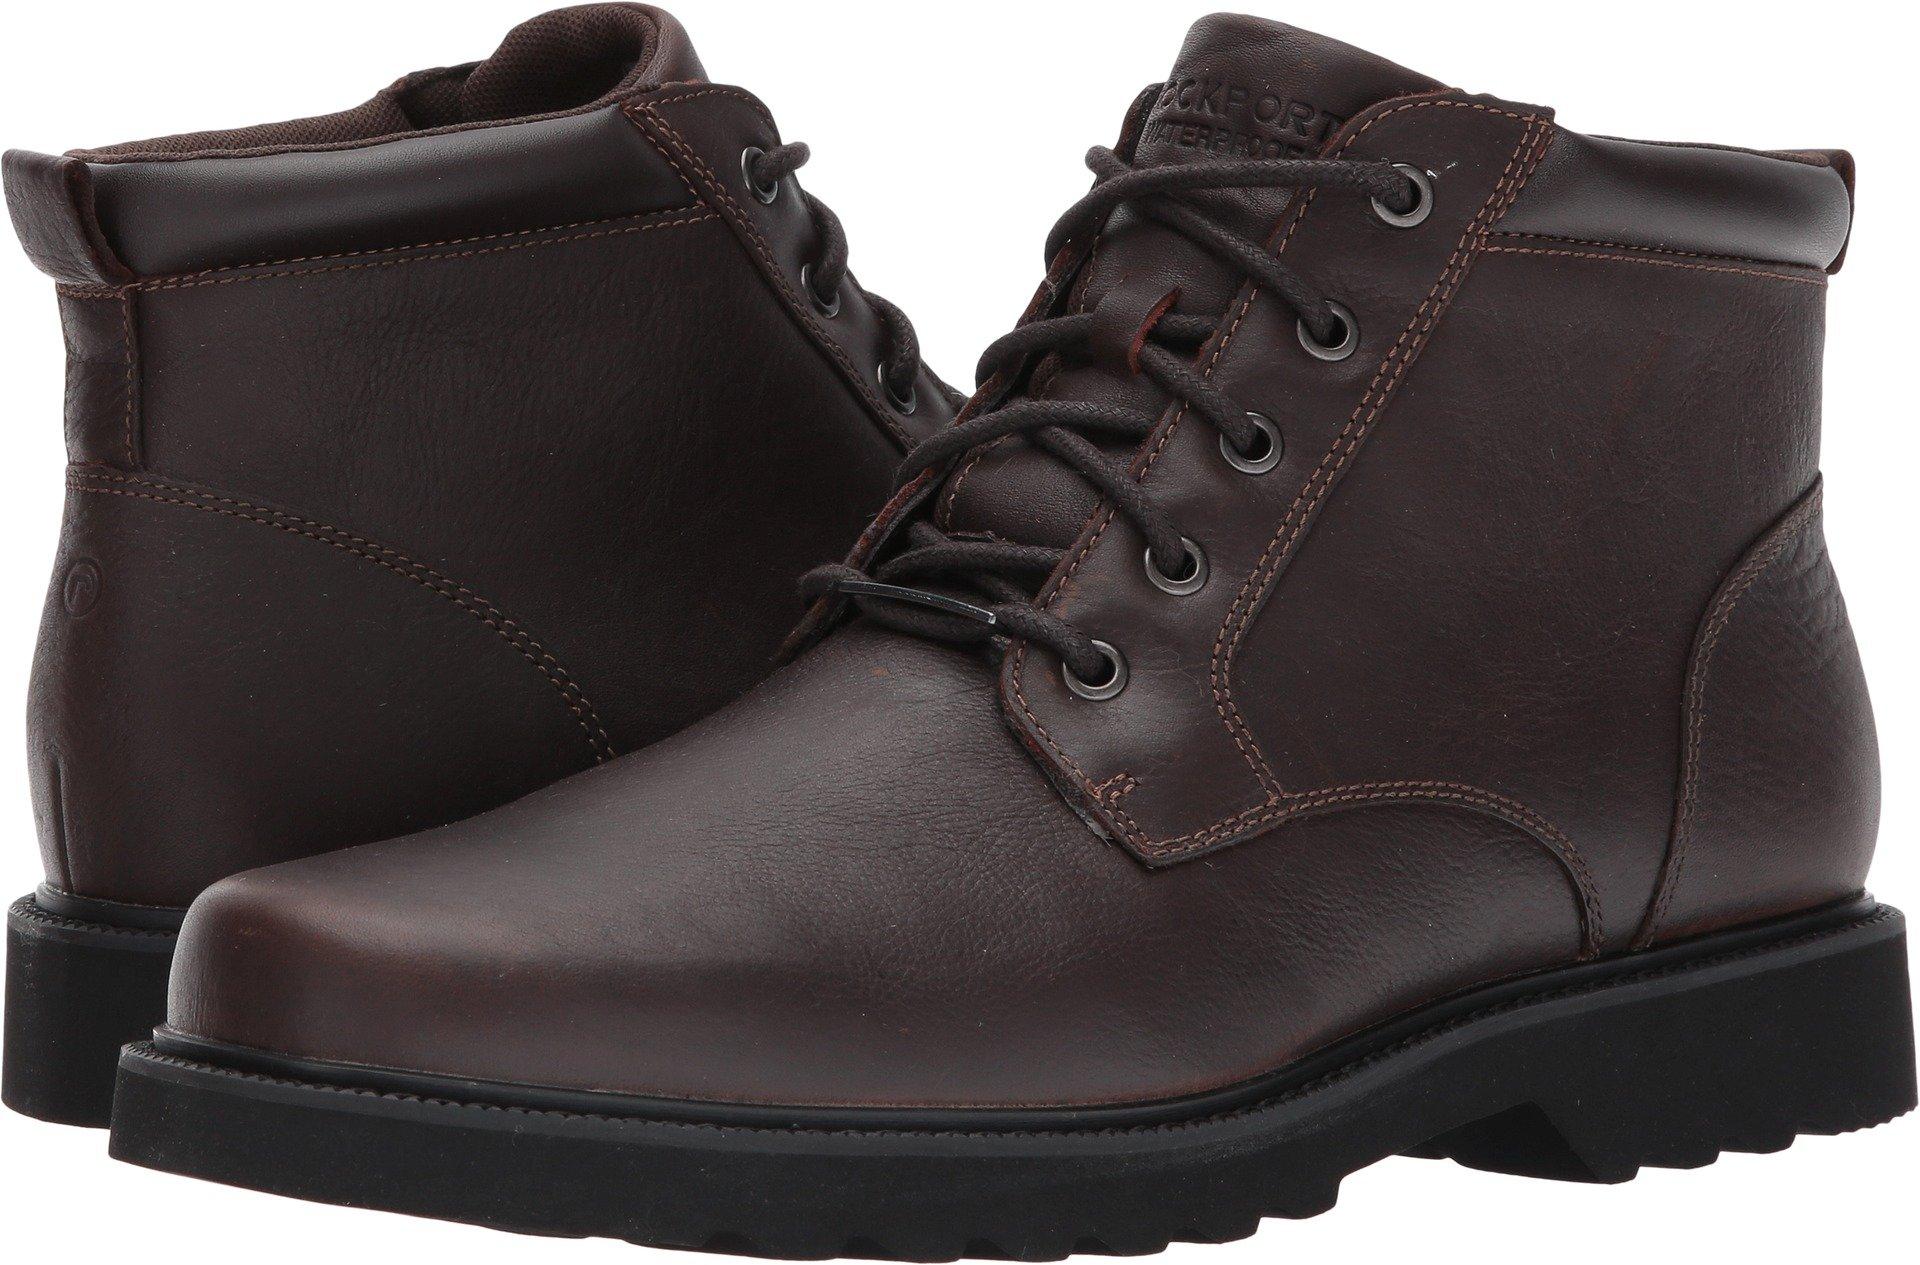 Rockport Men's Northfield WP Plain Toe Chukka Boot- Chocolate Waterproof-10.5 XW